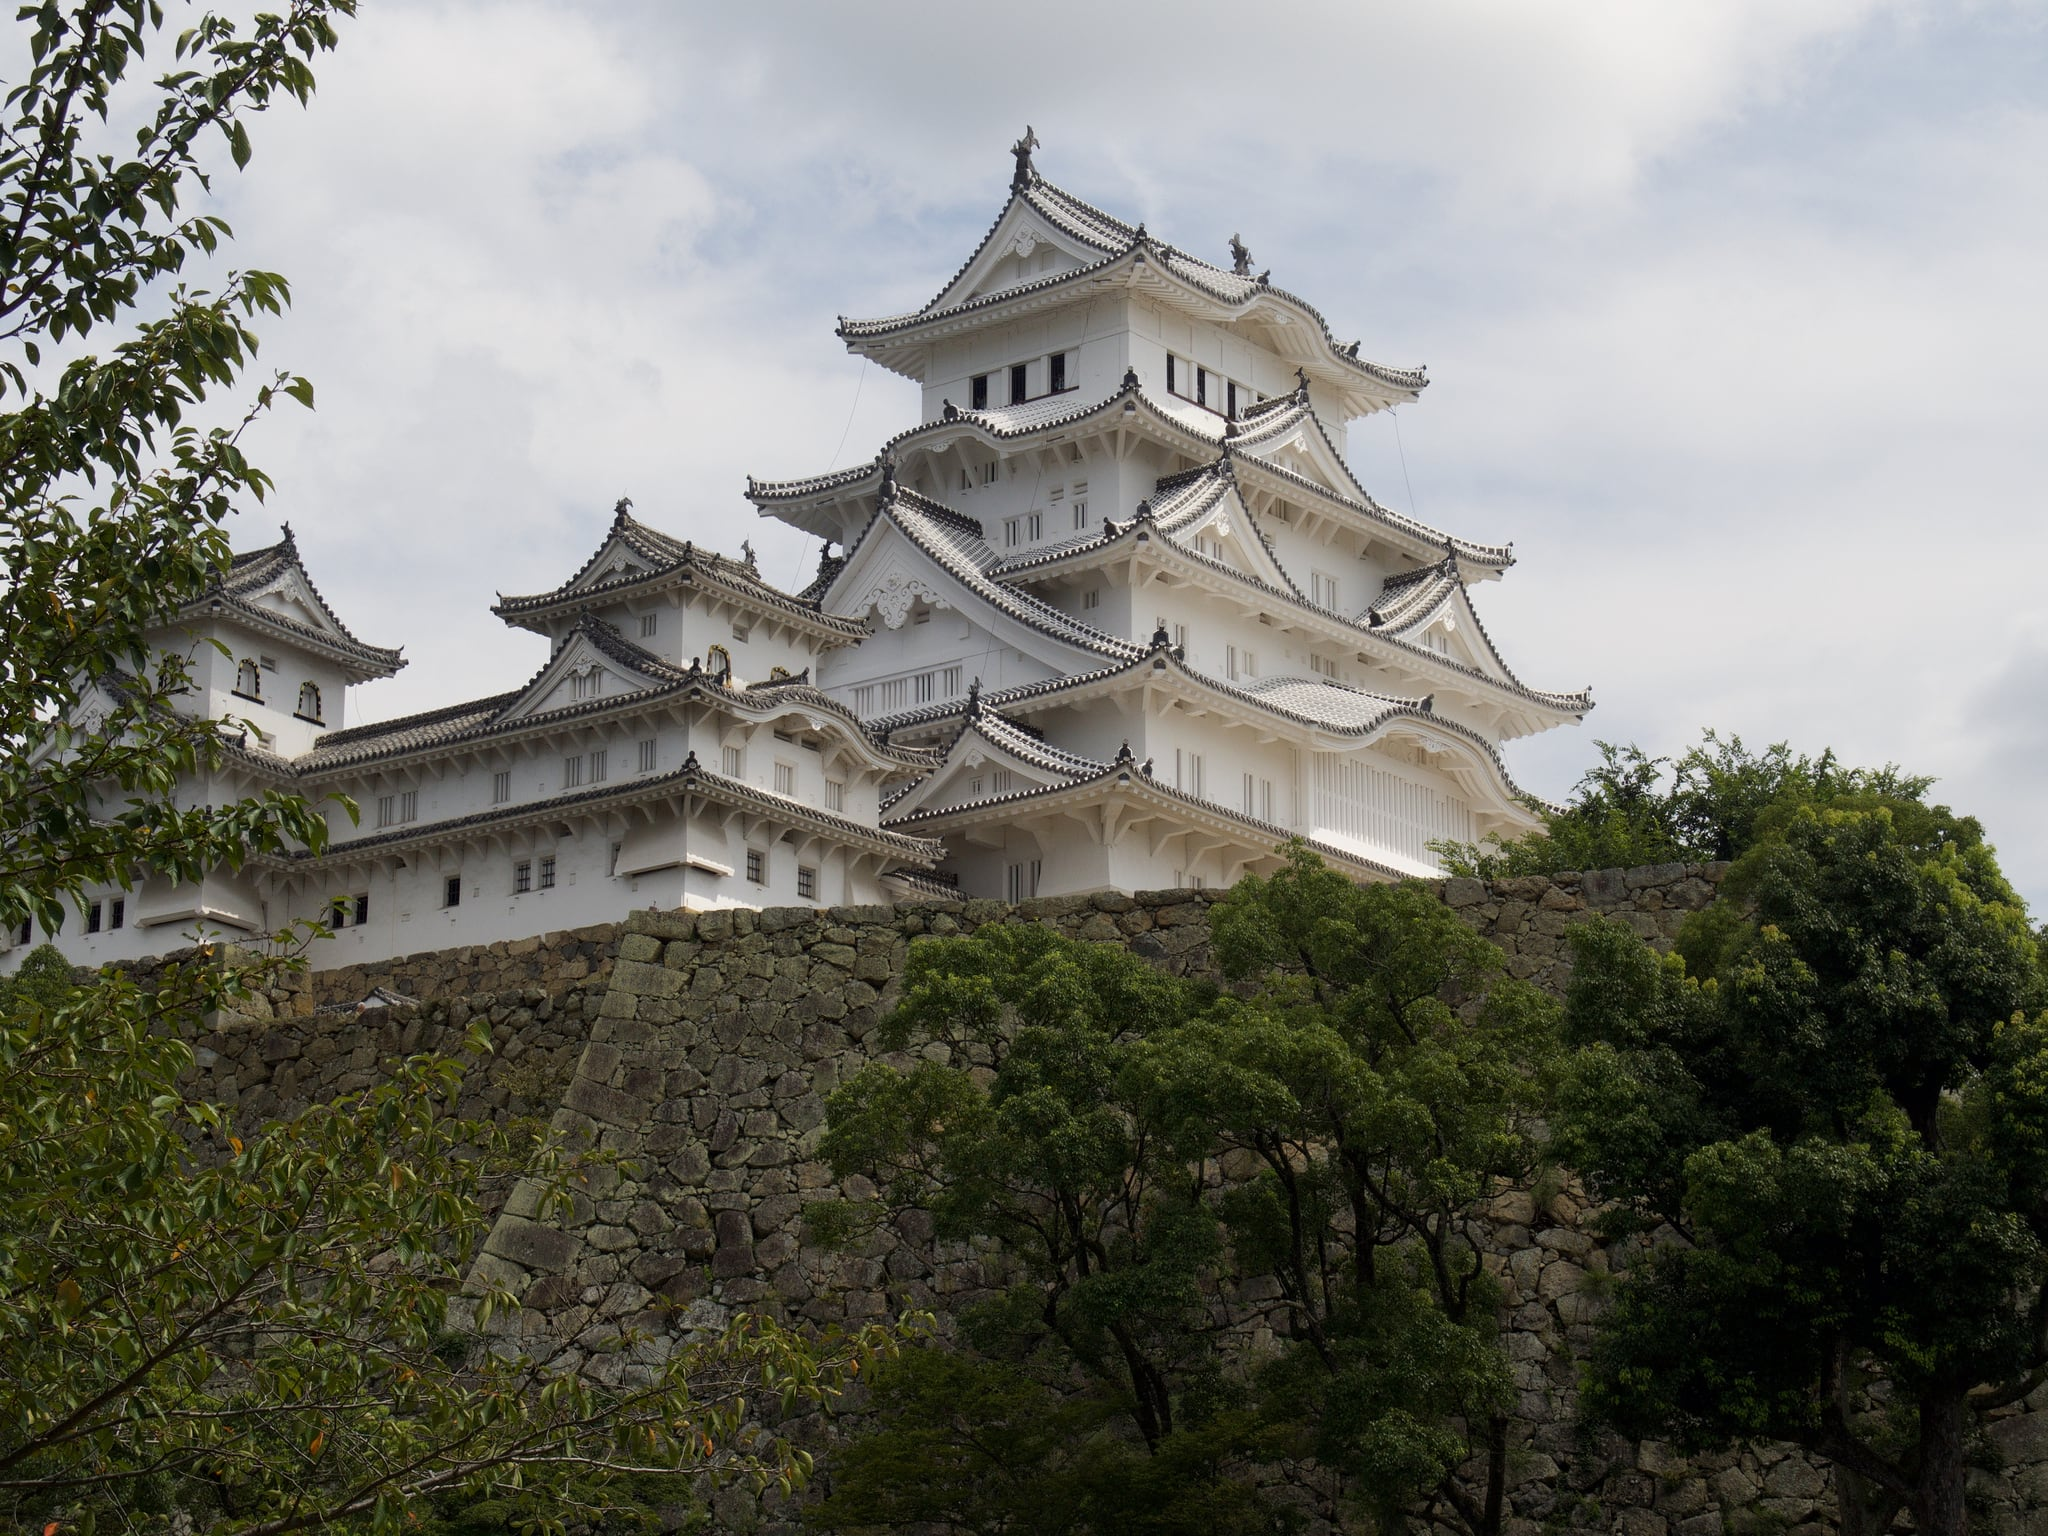 Himeji Castle 的形象. japan himeji